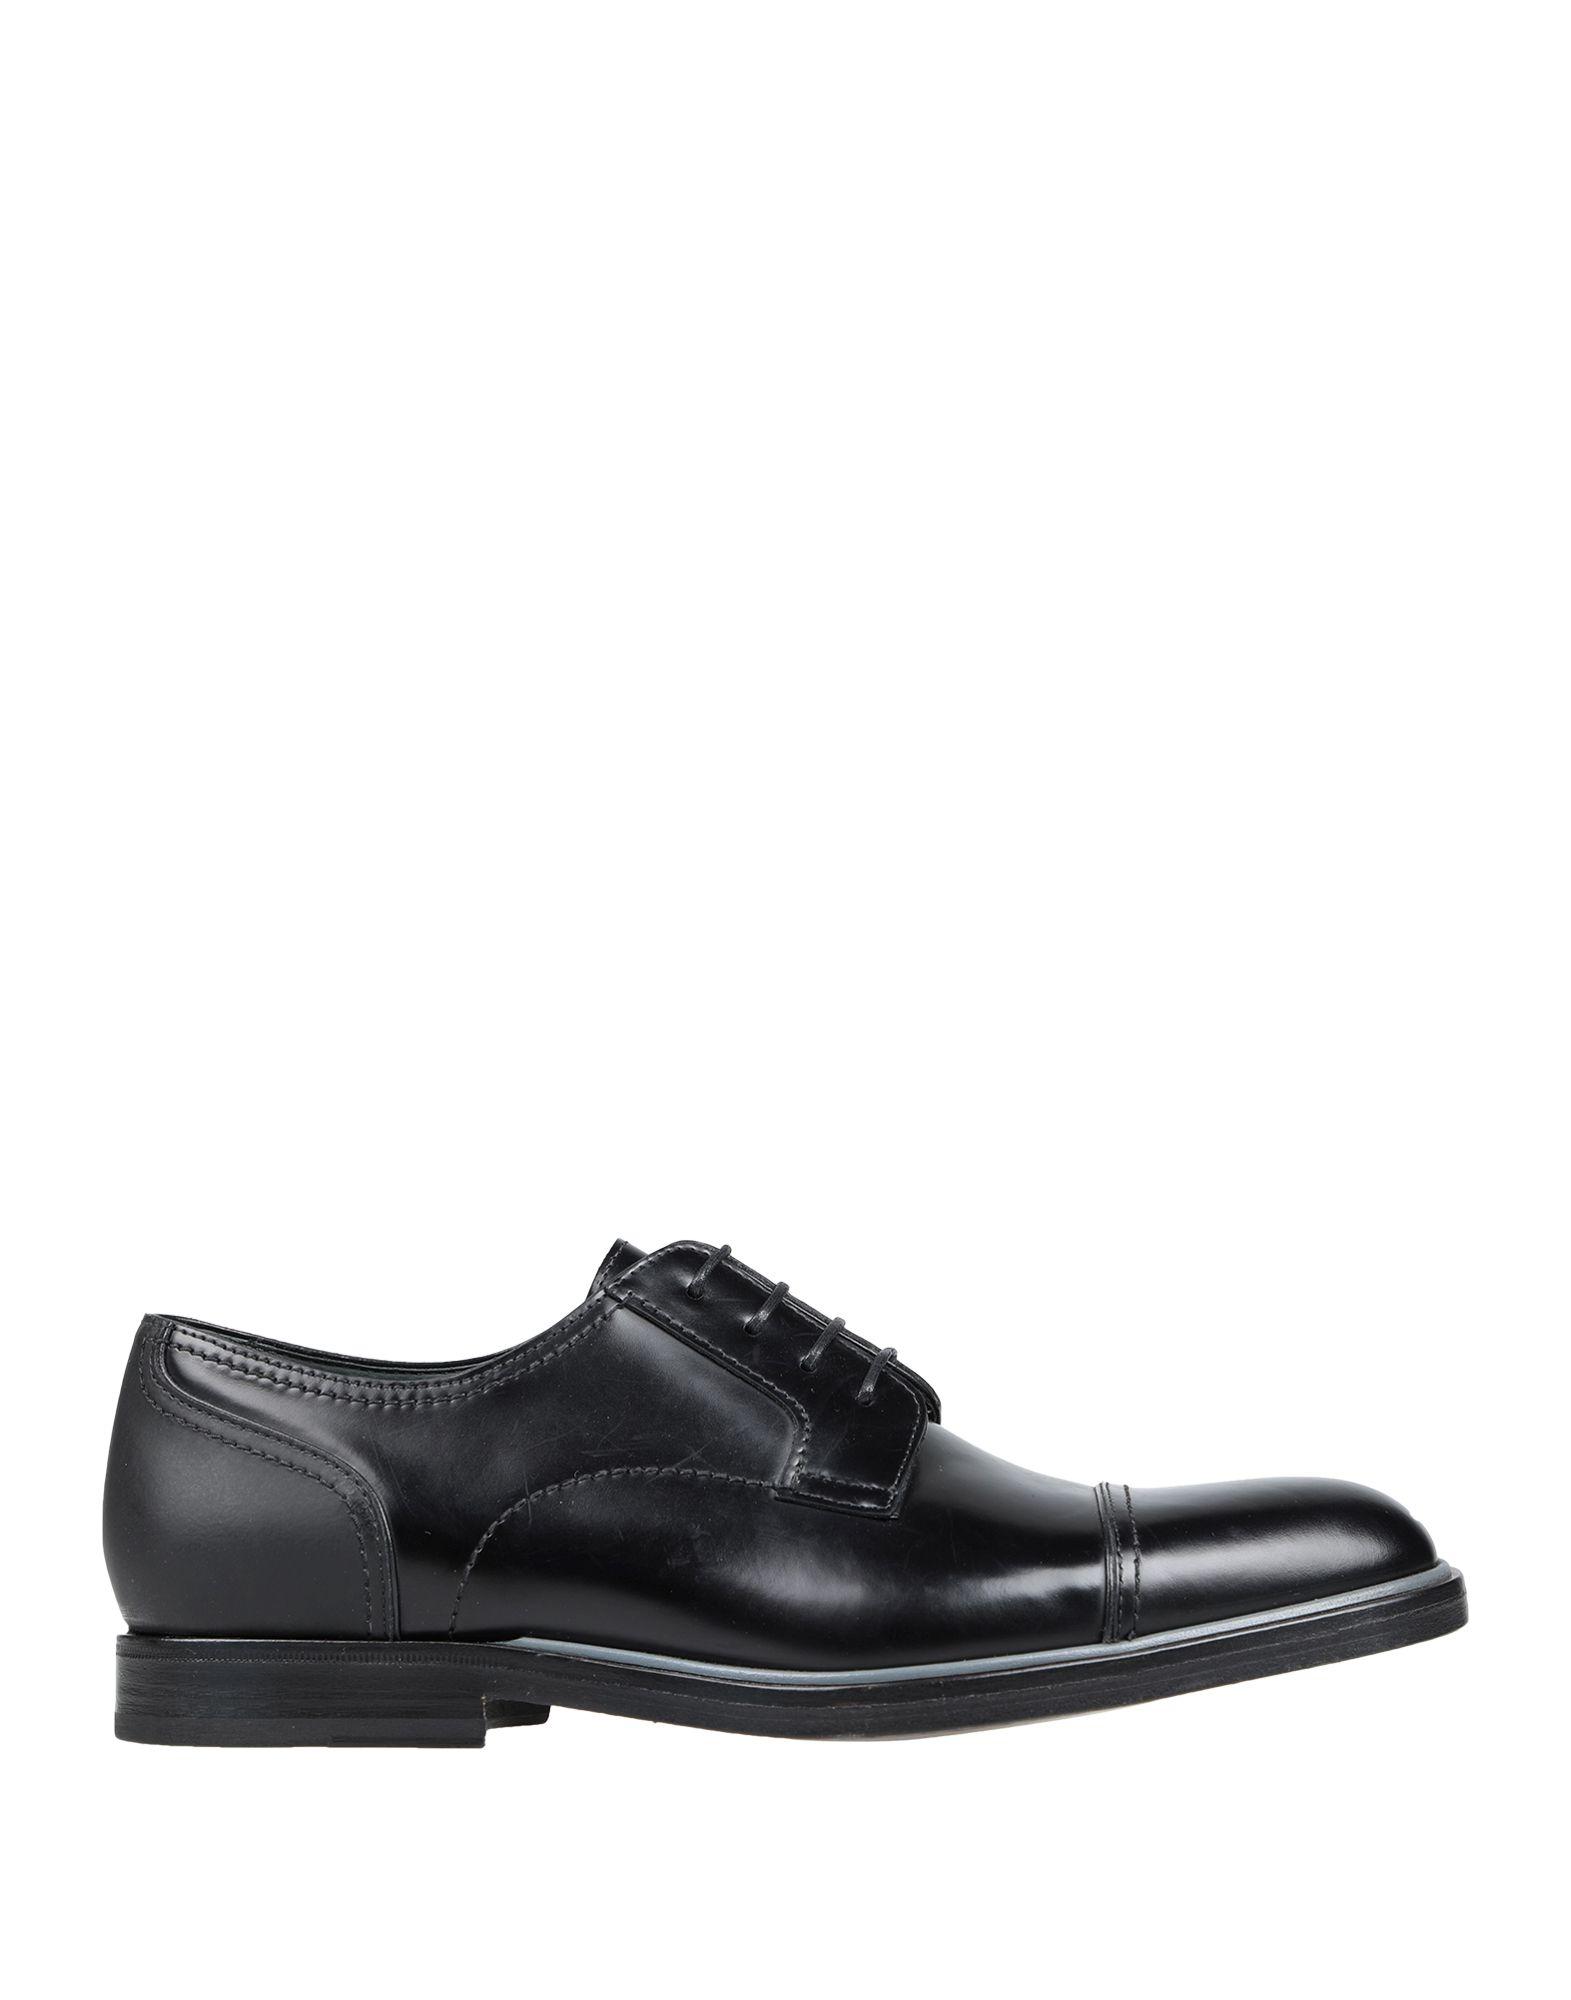 LANVIN Обувь на шнурках первый внутри обувь обувь обувь обувь обувь обувь обувь обувь обувь 8a2549 мужская армия green 40 метров